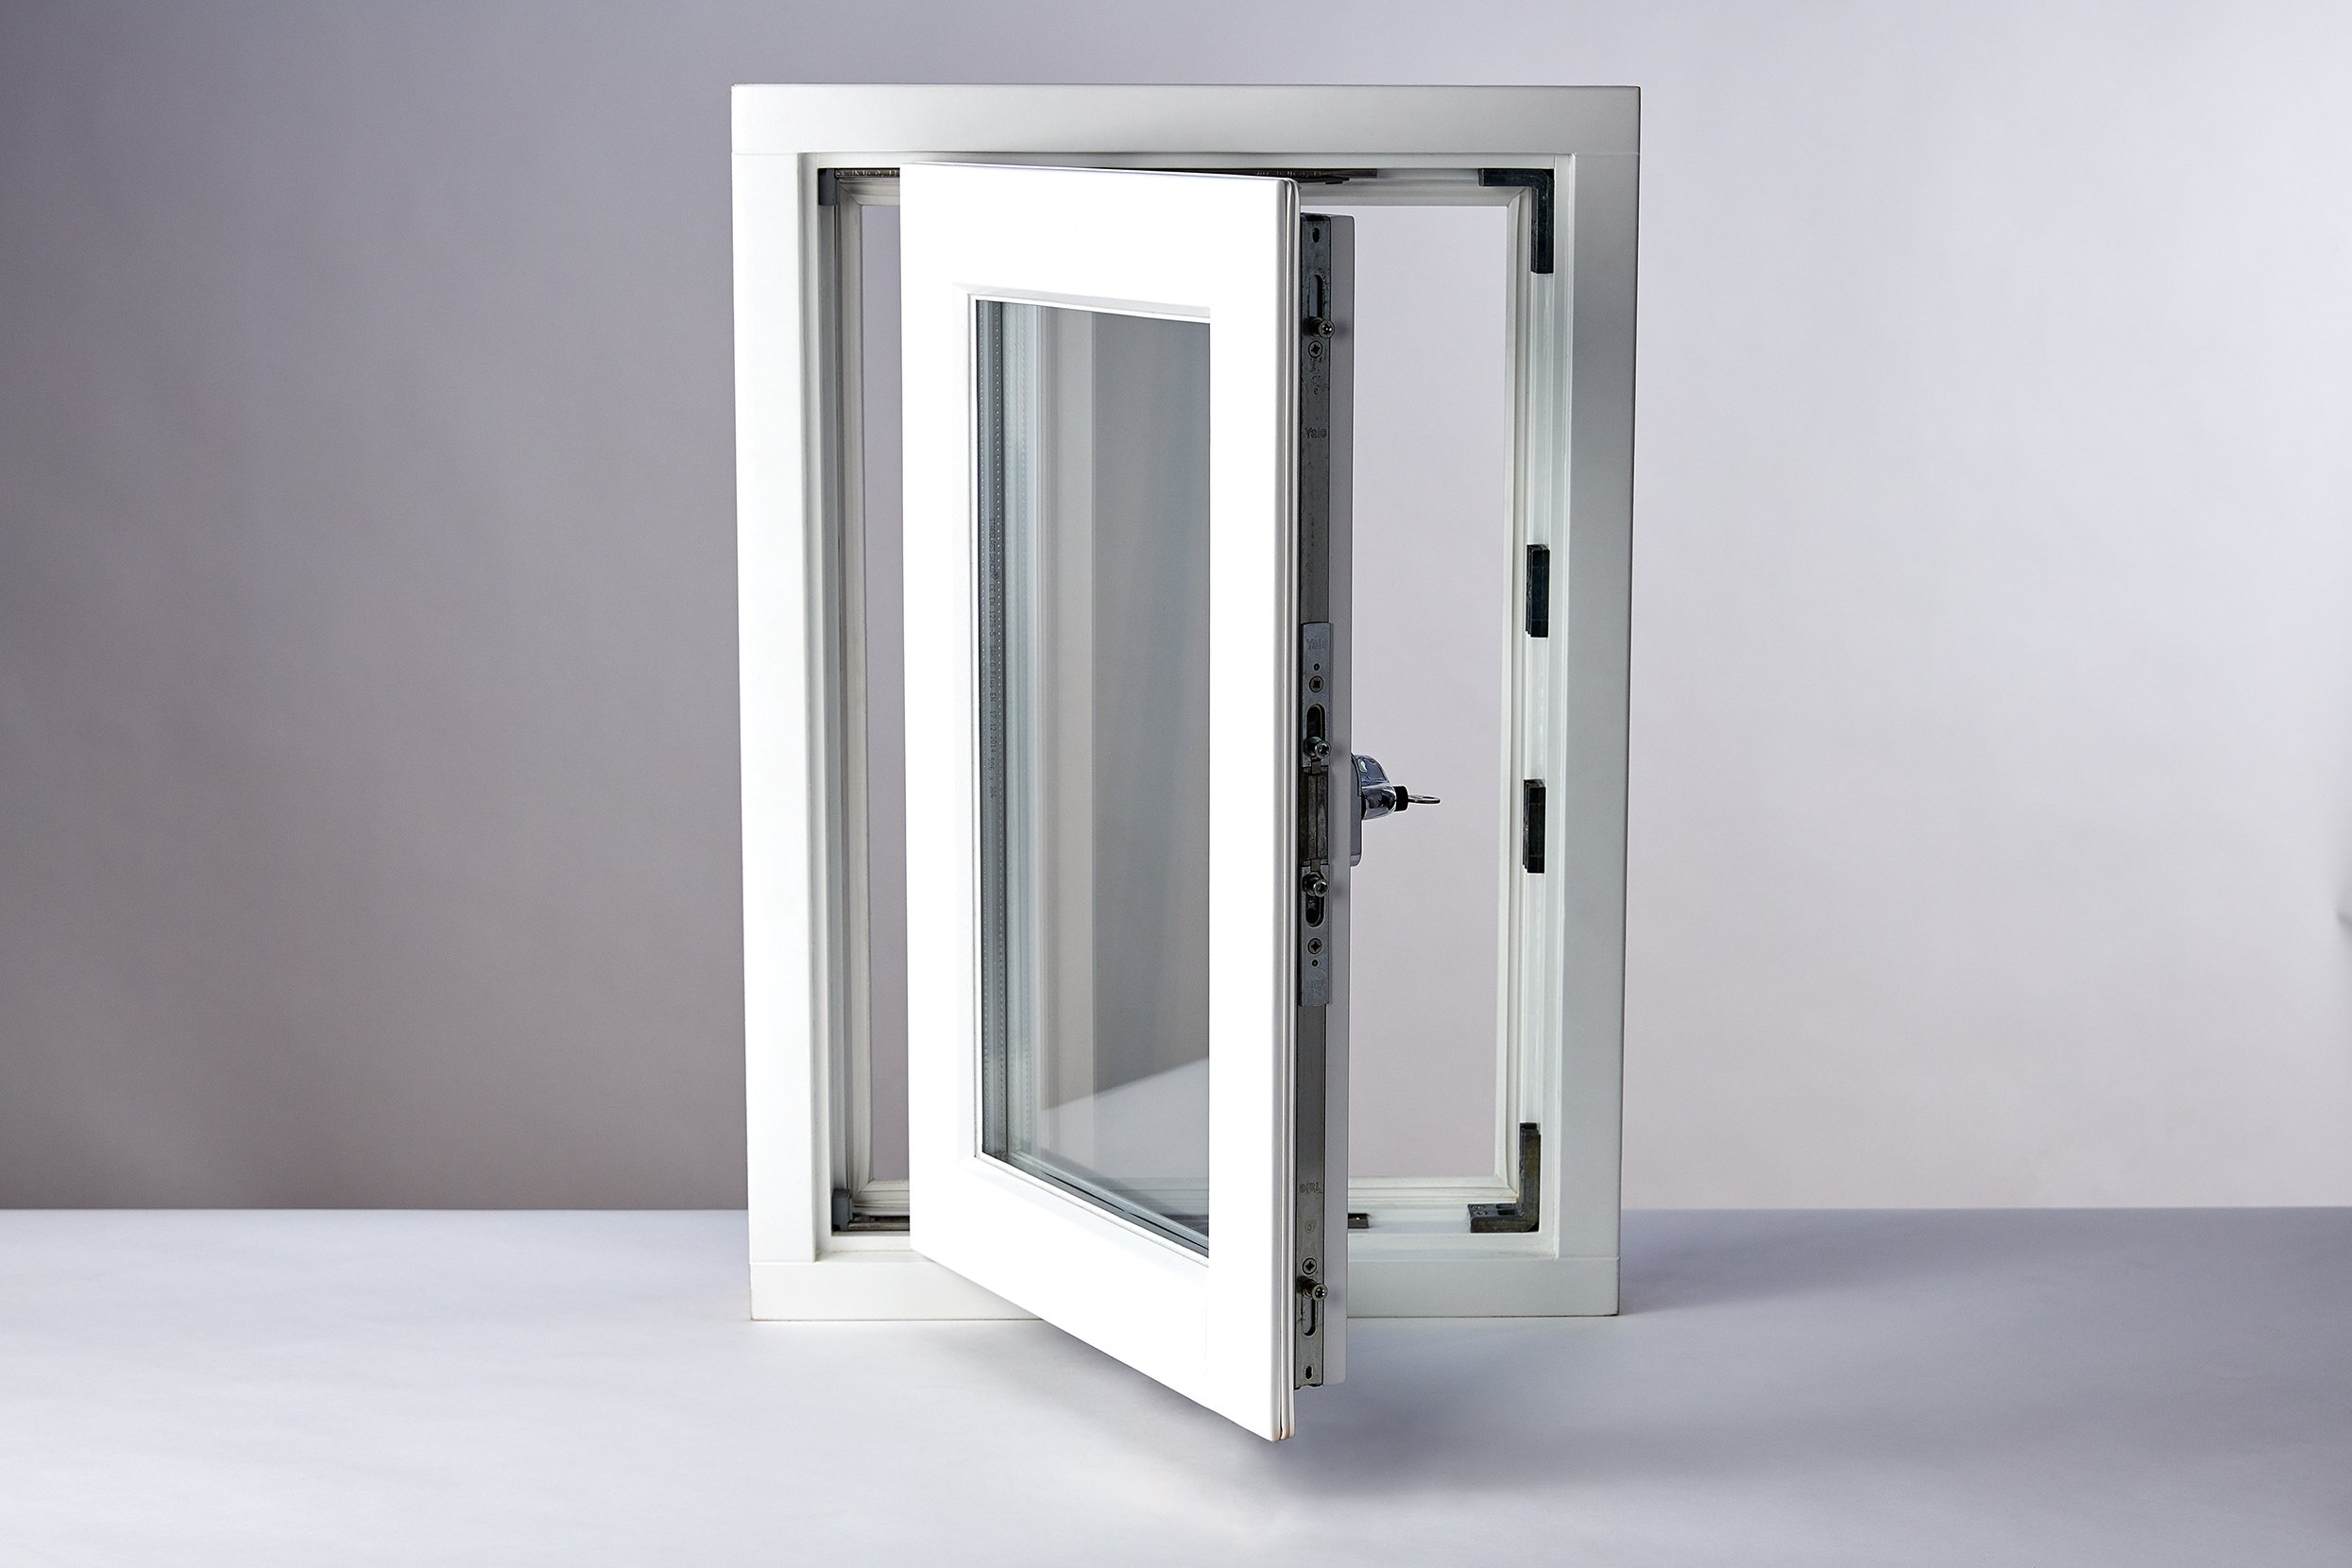 soundproof Sash Windows open